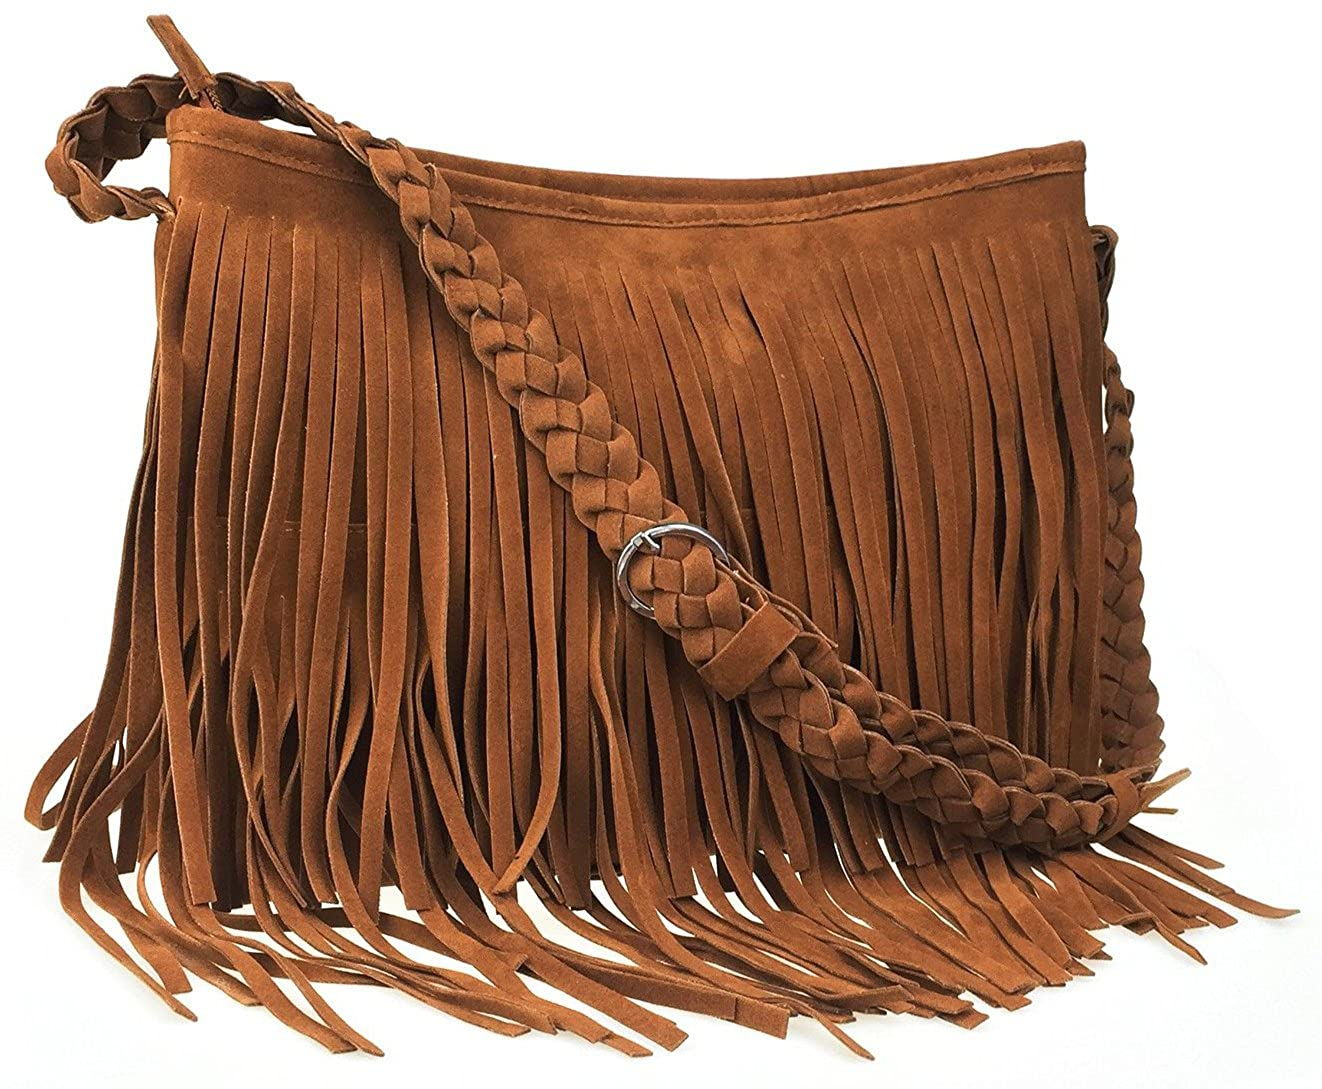 dbd6c7728c85 Amazon.com: Ayliss Hippie Suede Fringe Tassel Messenger Bag Women Hobo  Shoulder Bags Crossbody Handbag,Brown: Shoes